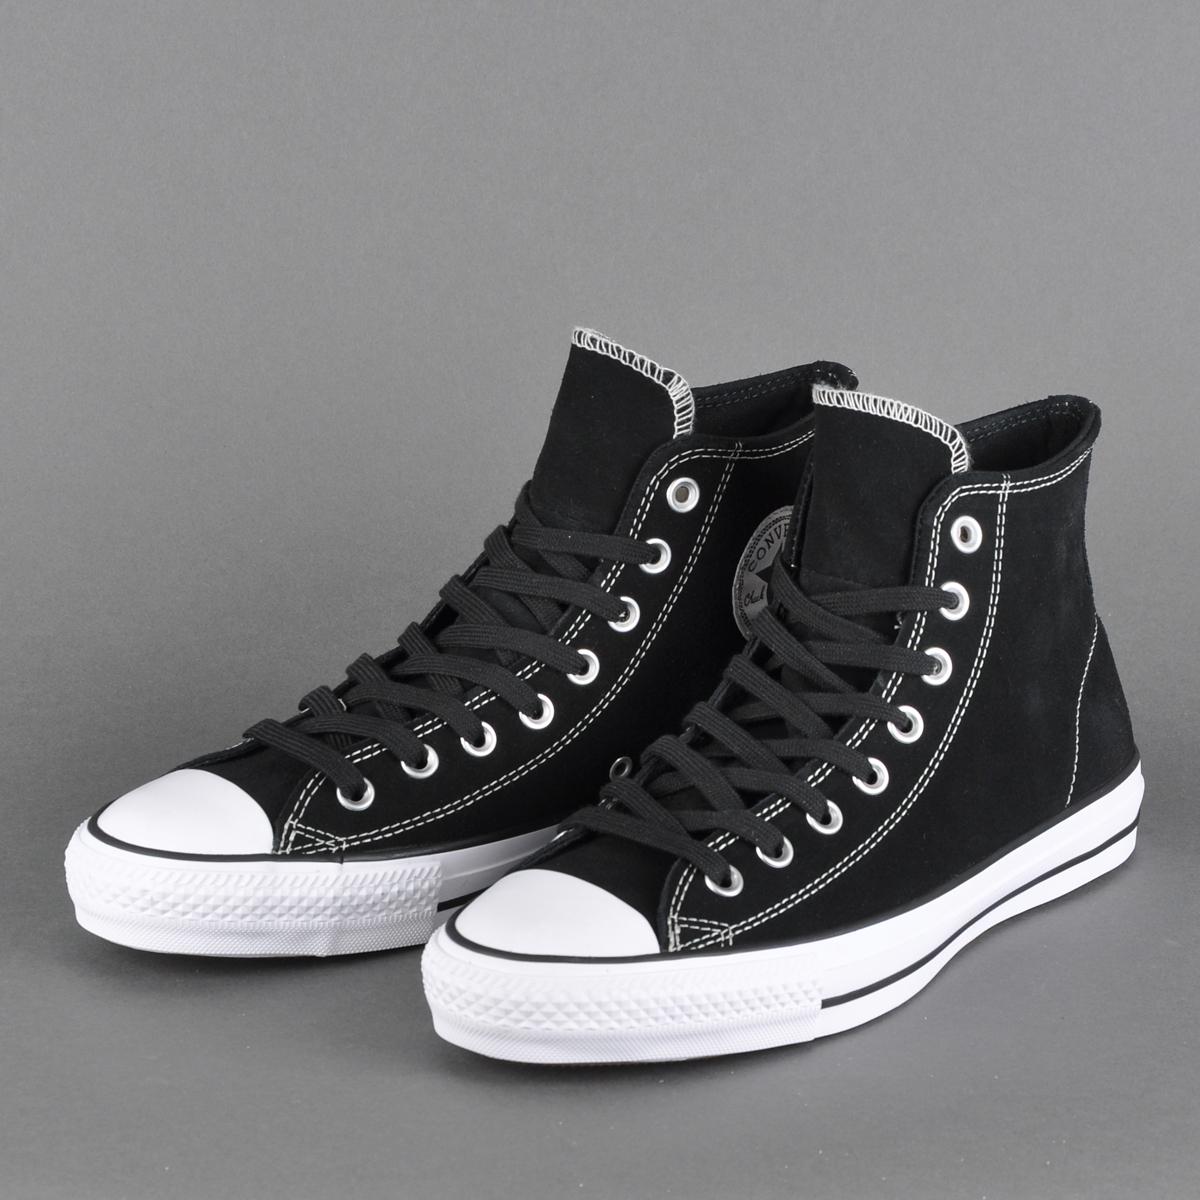 terraza Dinkarville insondable  Converse Cons CTAS Pro Hi Suede, black / black / white   Beyond